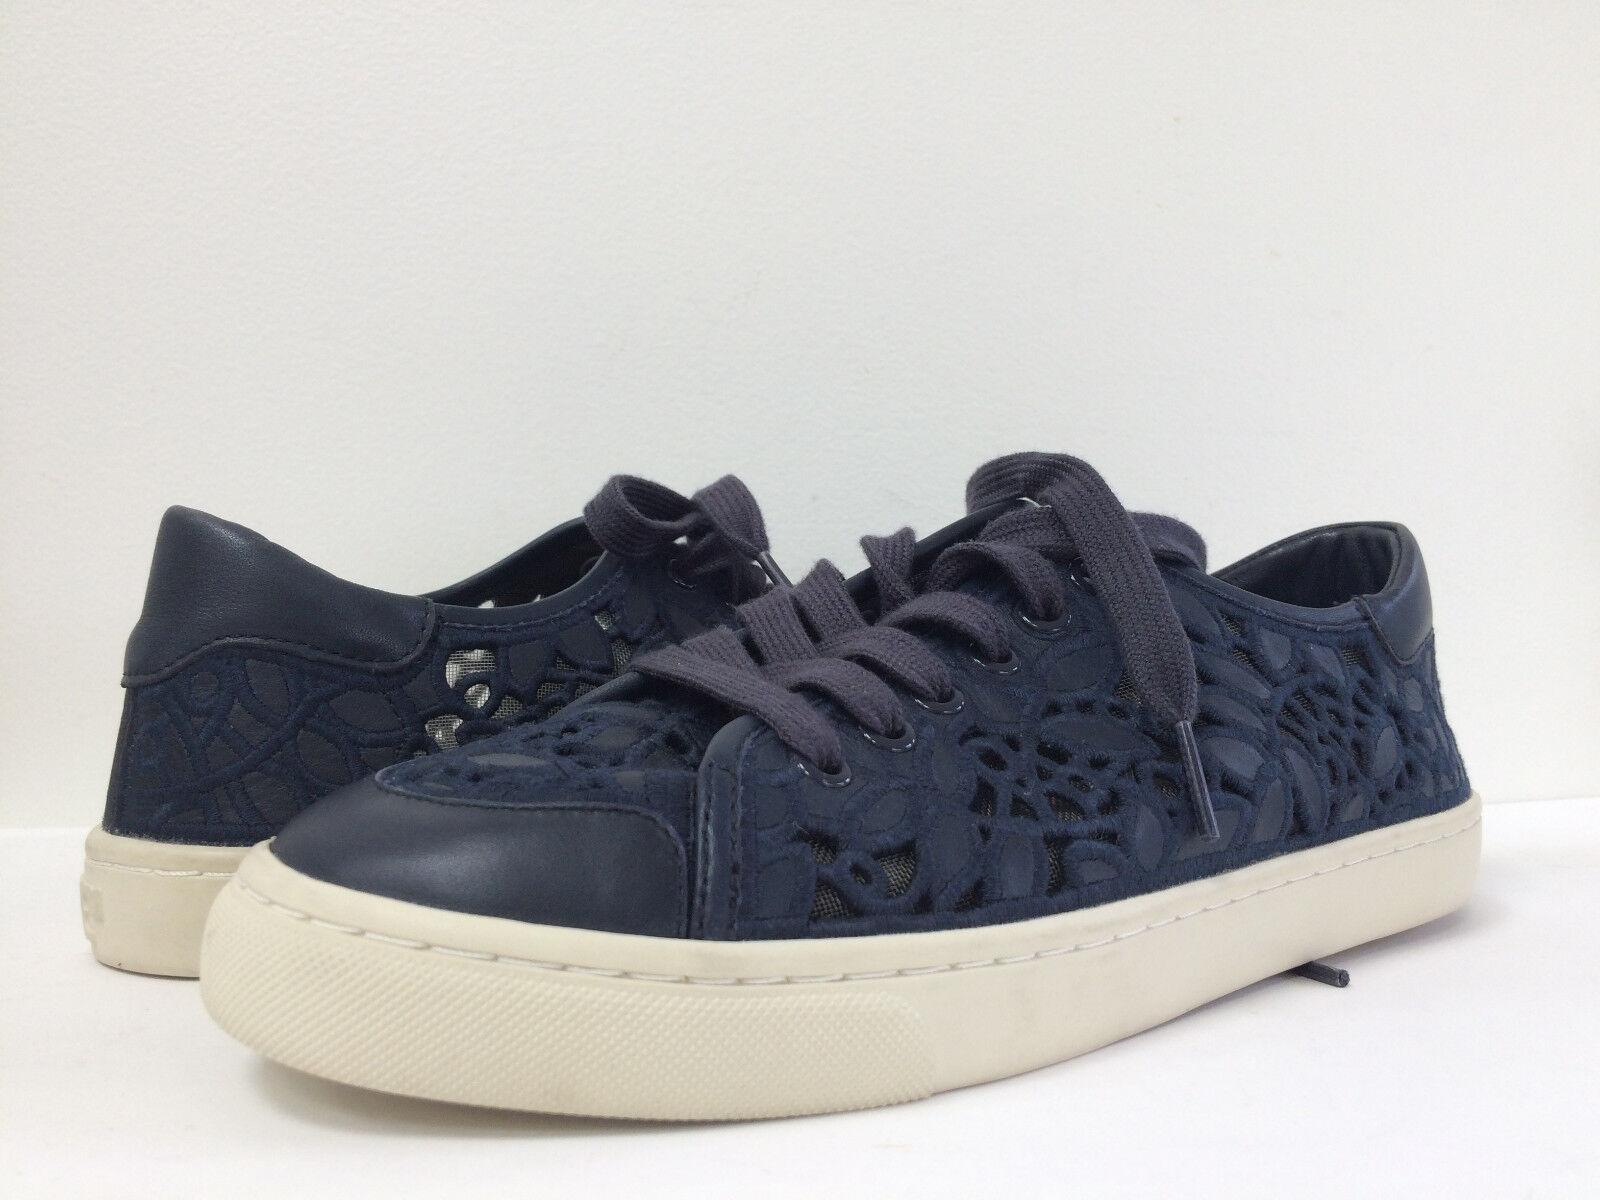 New Tory burch Mesh Rhea Embroidery Leder Lace Mesh burch Sneaker Tori Navy Sz 8.5M 9.5M df4e63